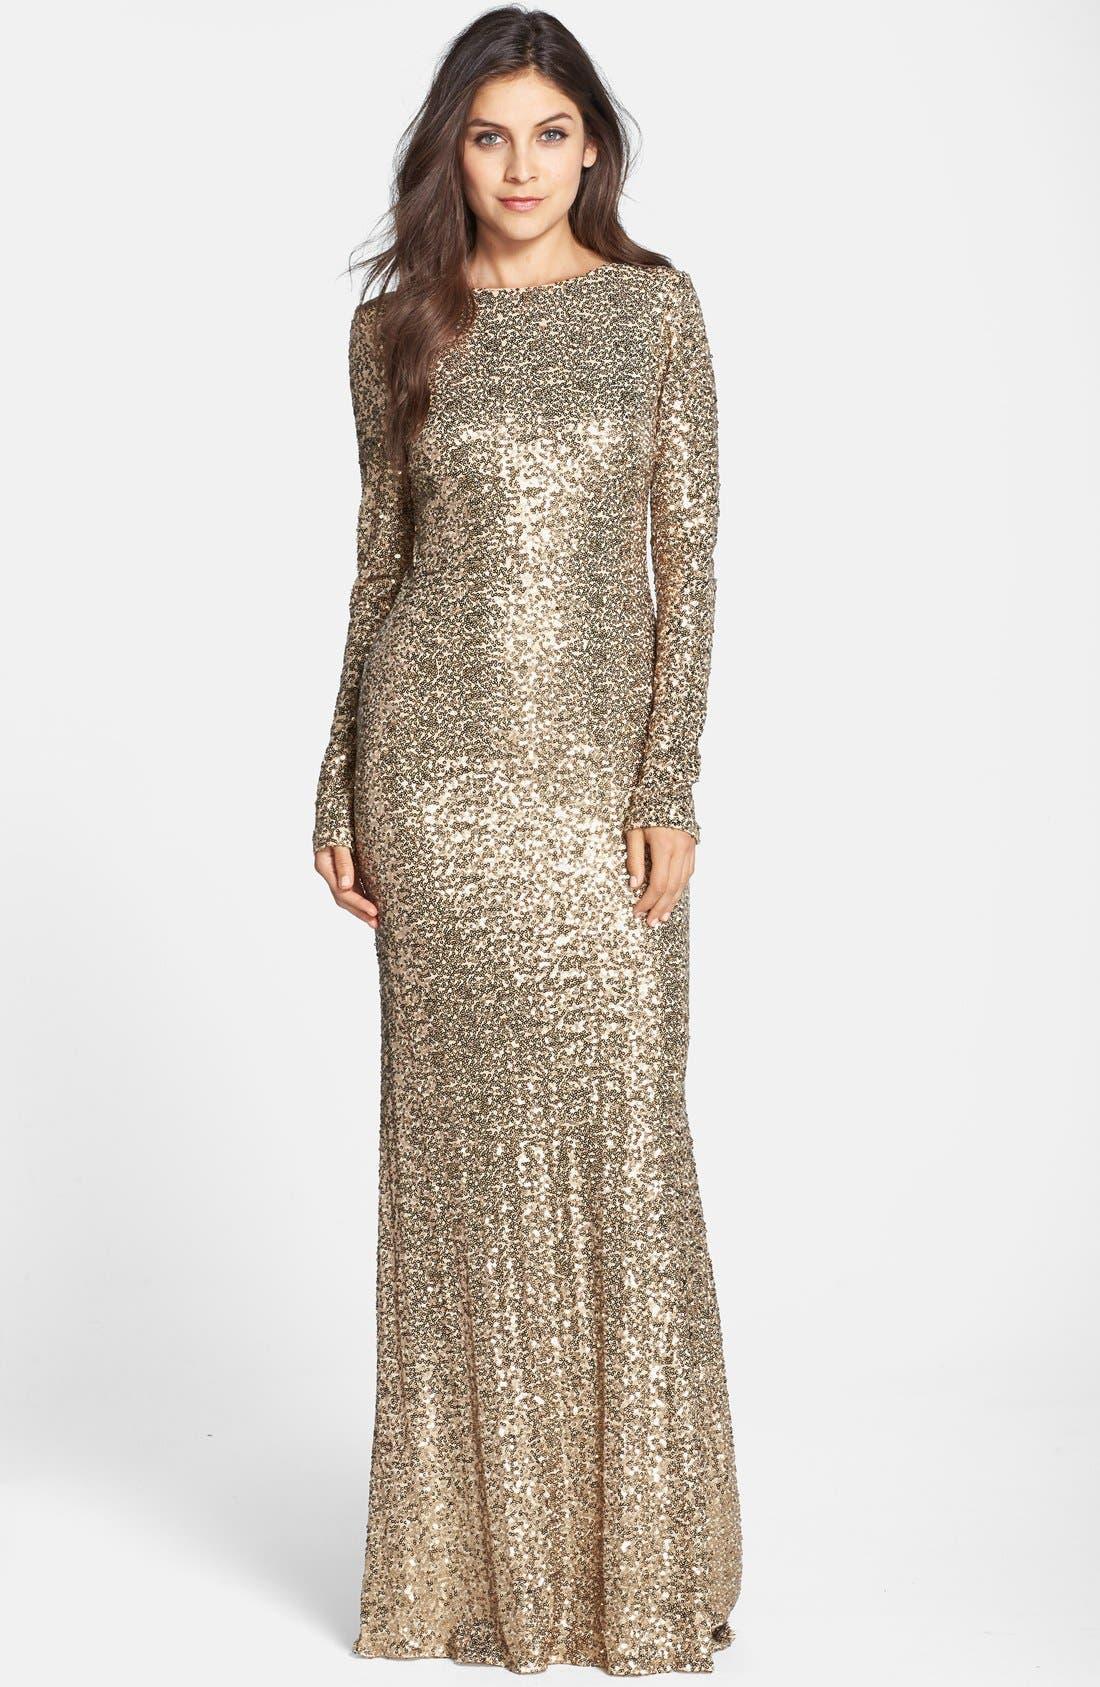 Alternate Image 1 Selected - Badgley Mischka Sequin Drape Back Gown